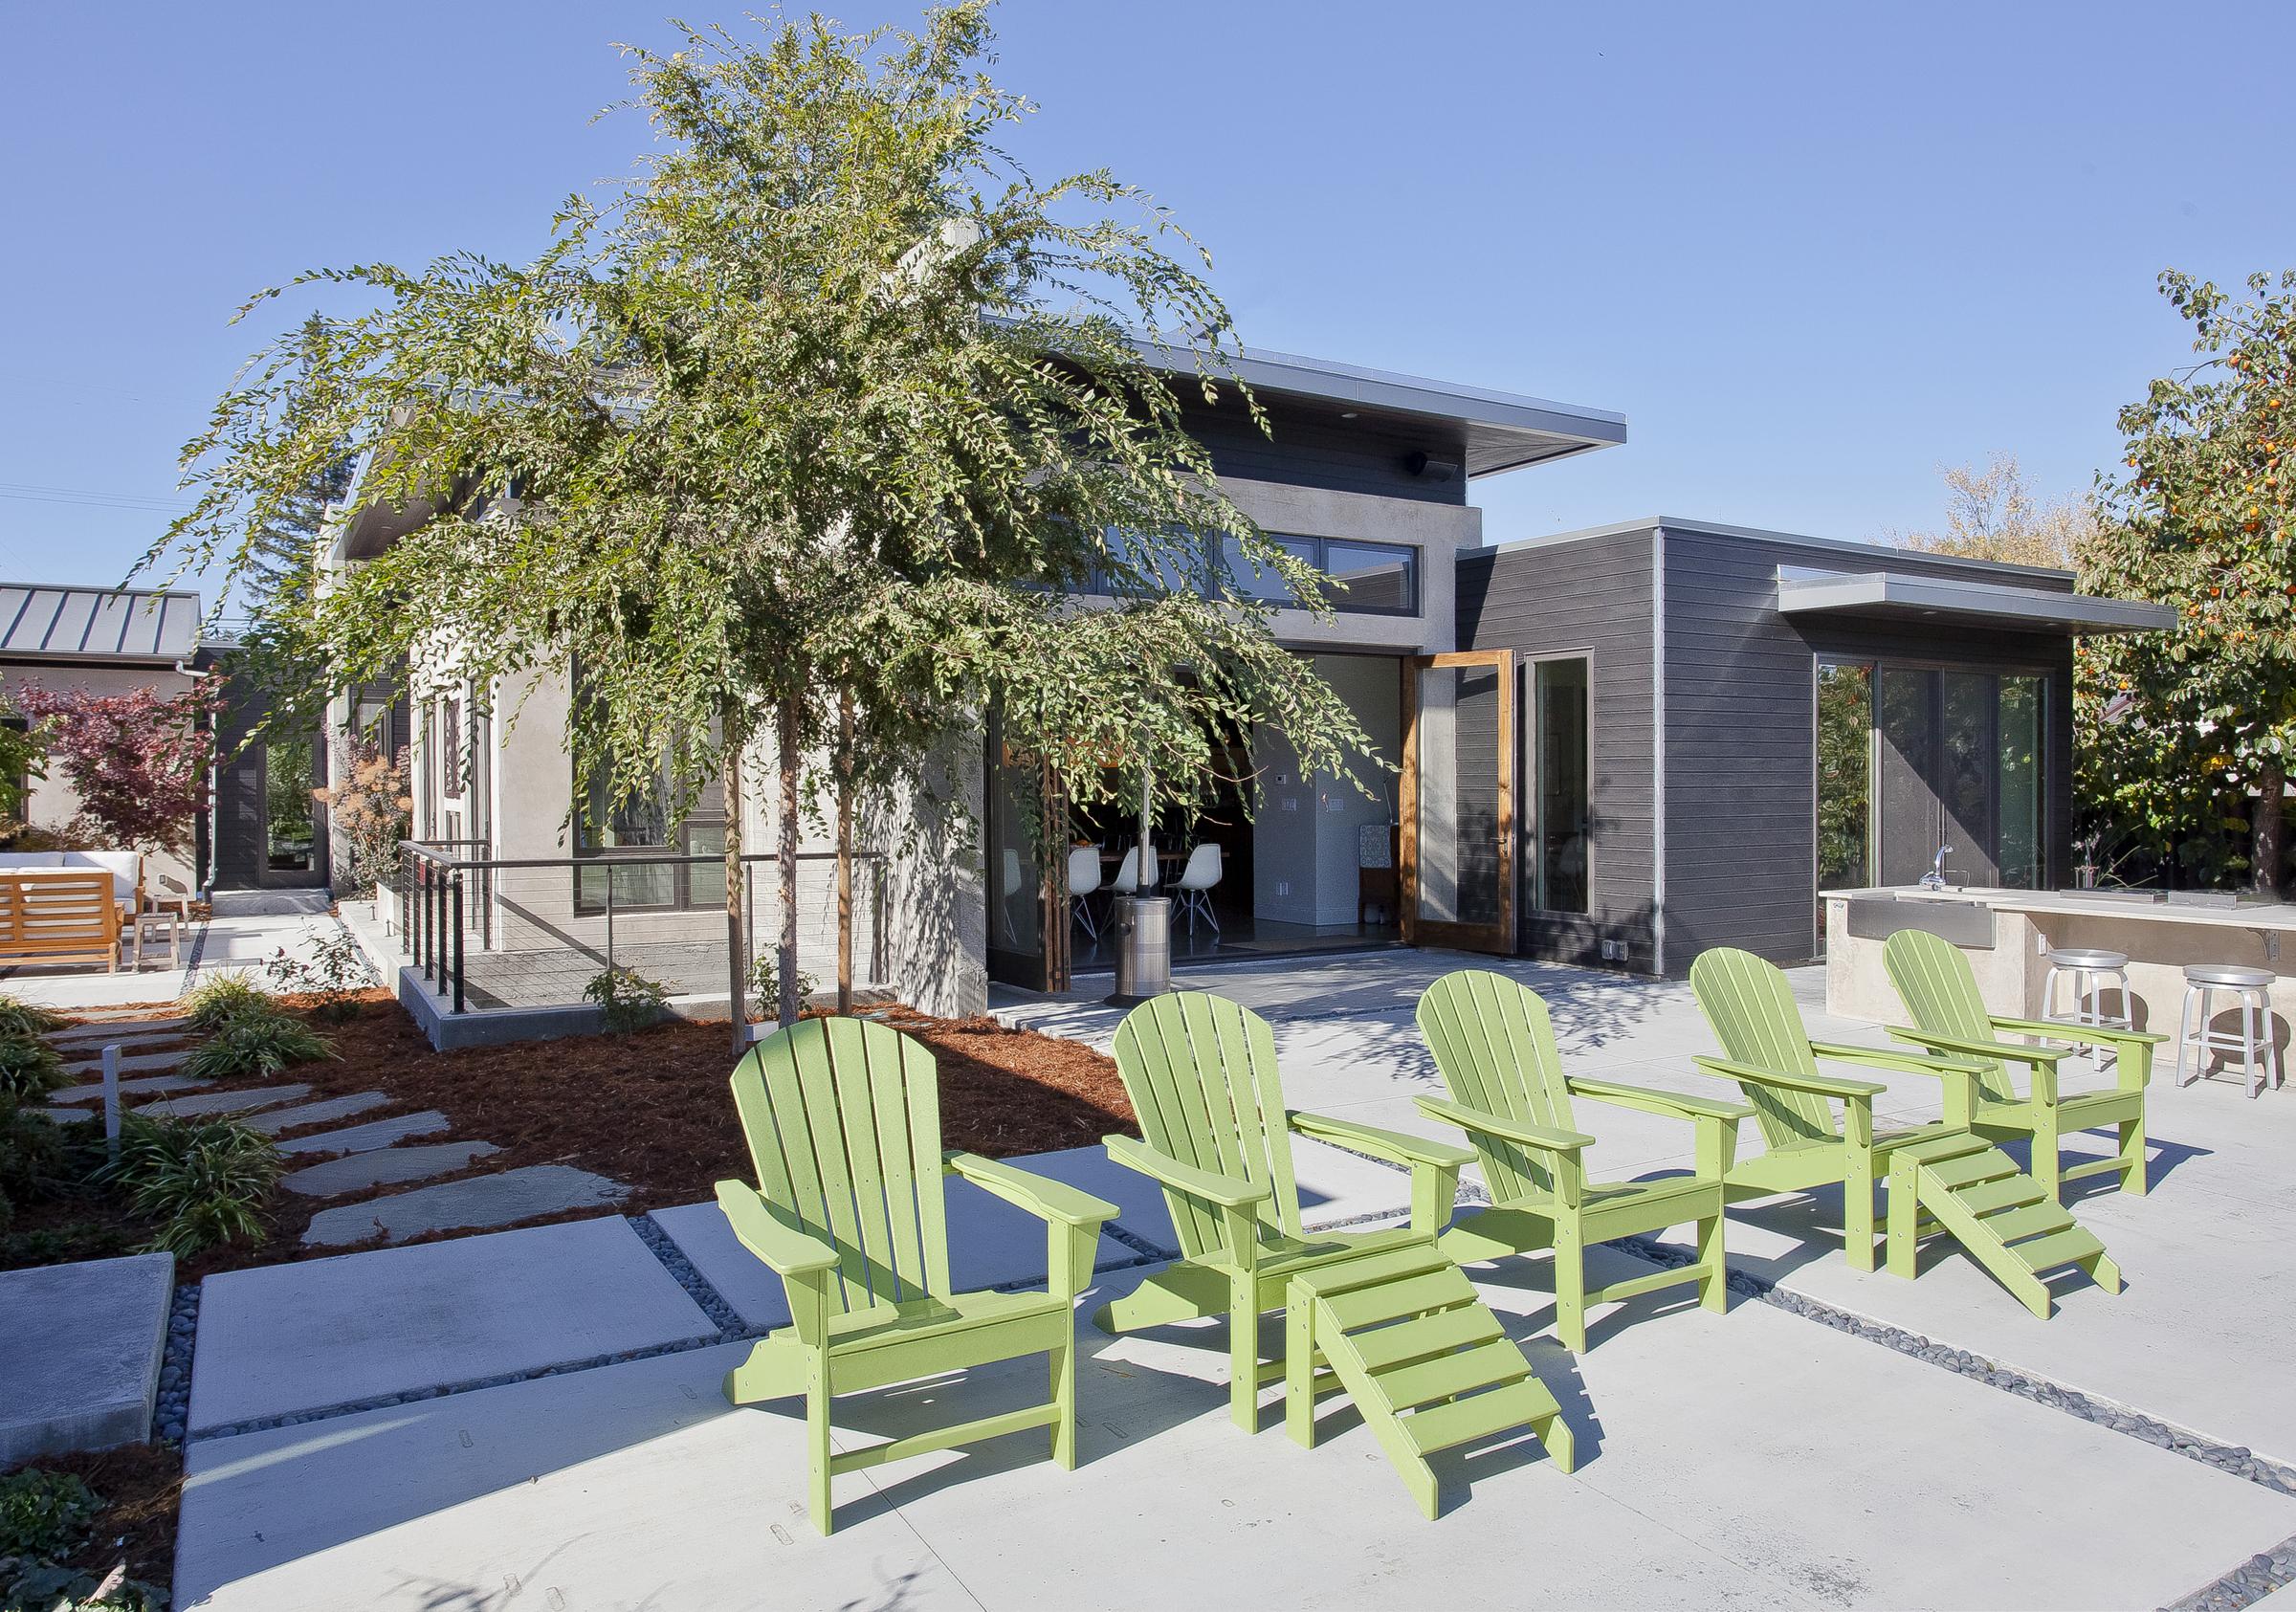 23-471 S. Clark Patio w:green chairs.jpg